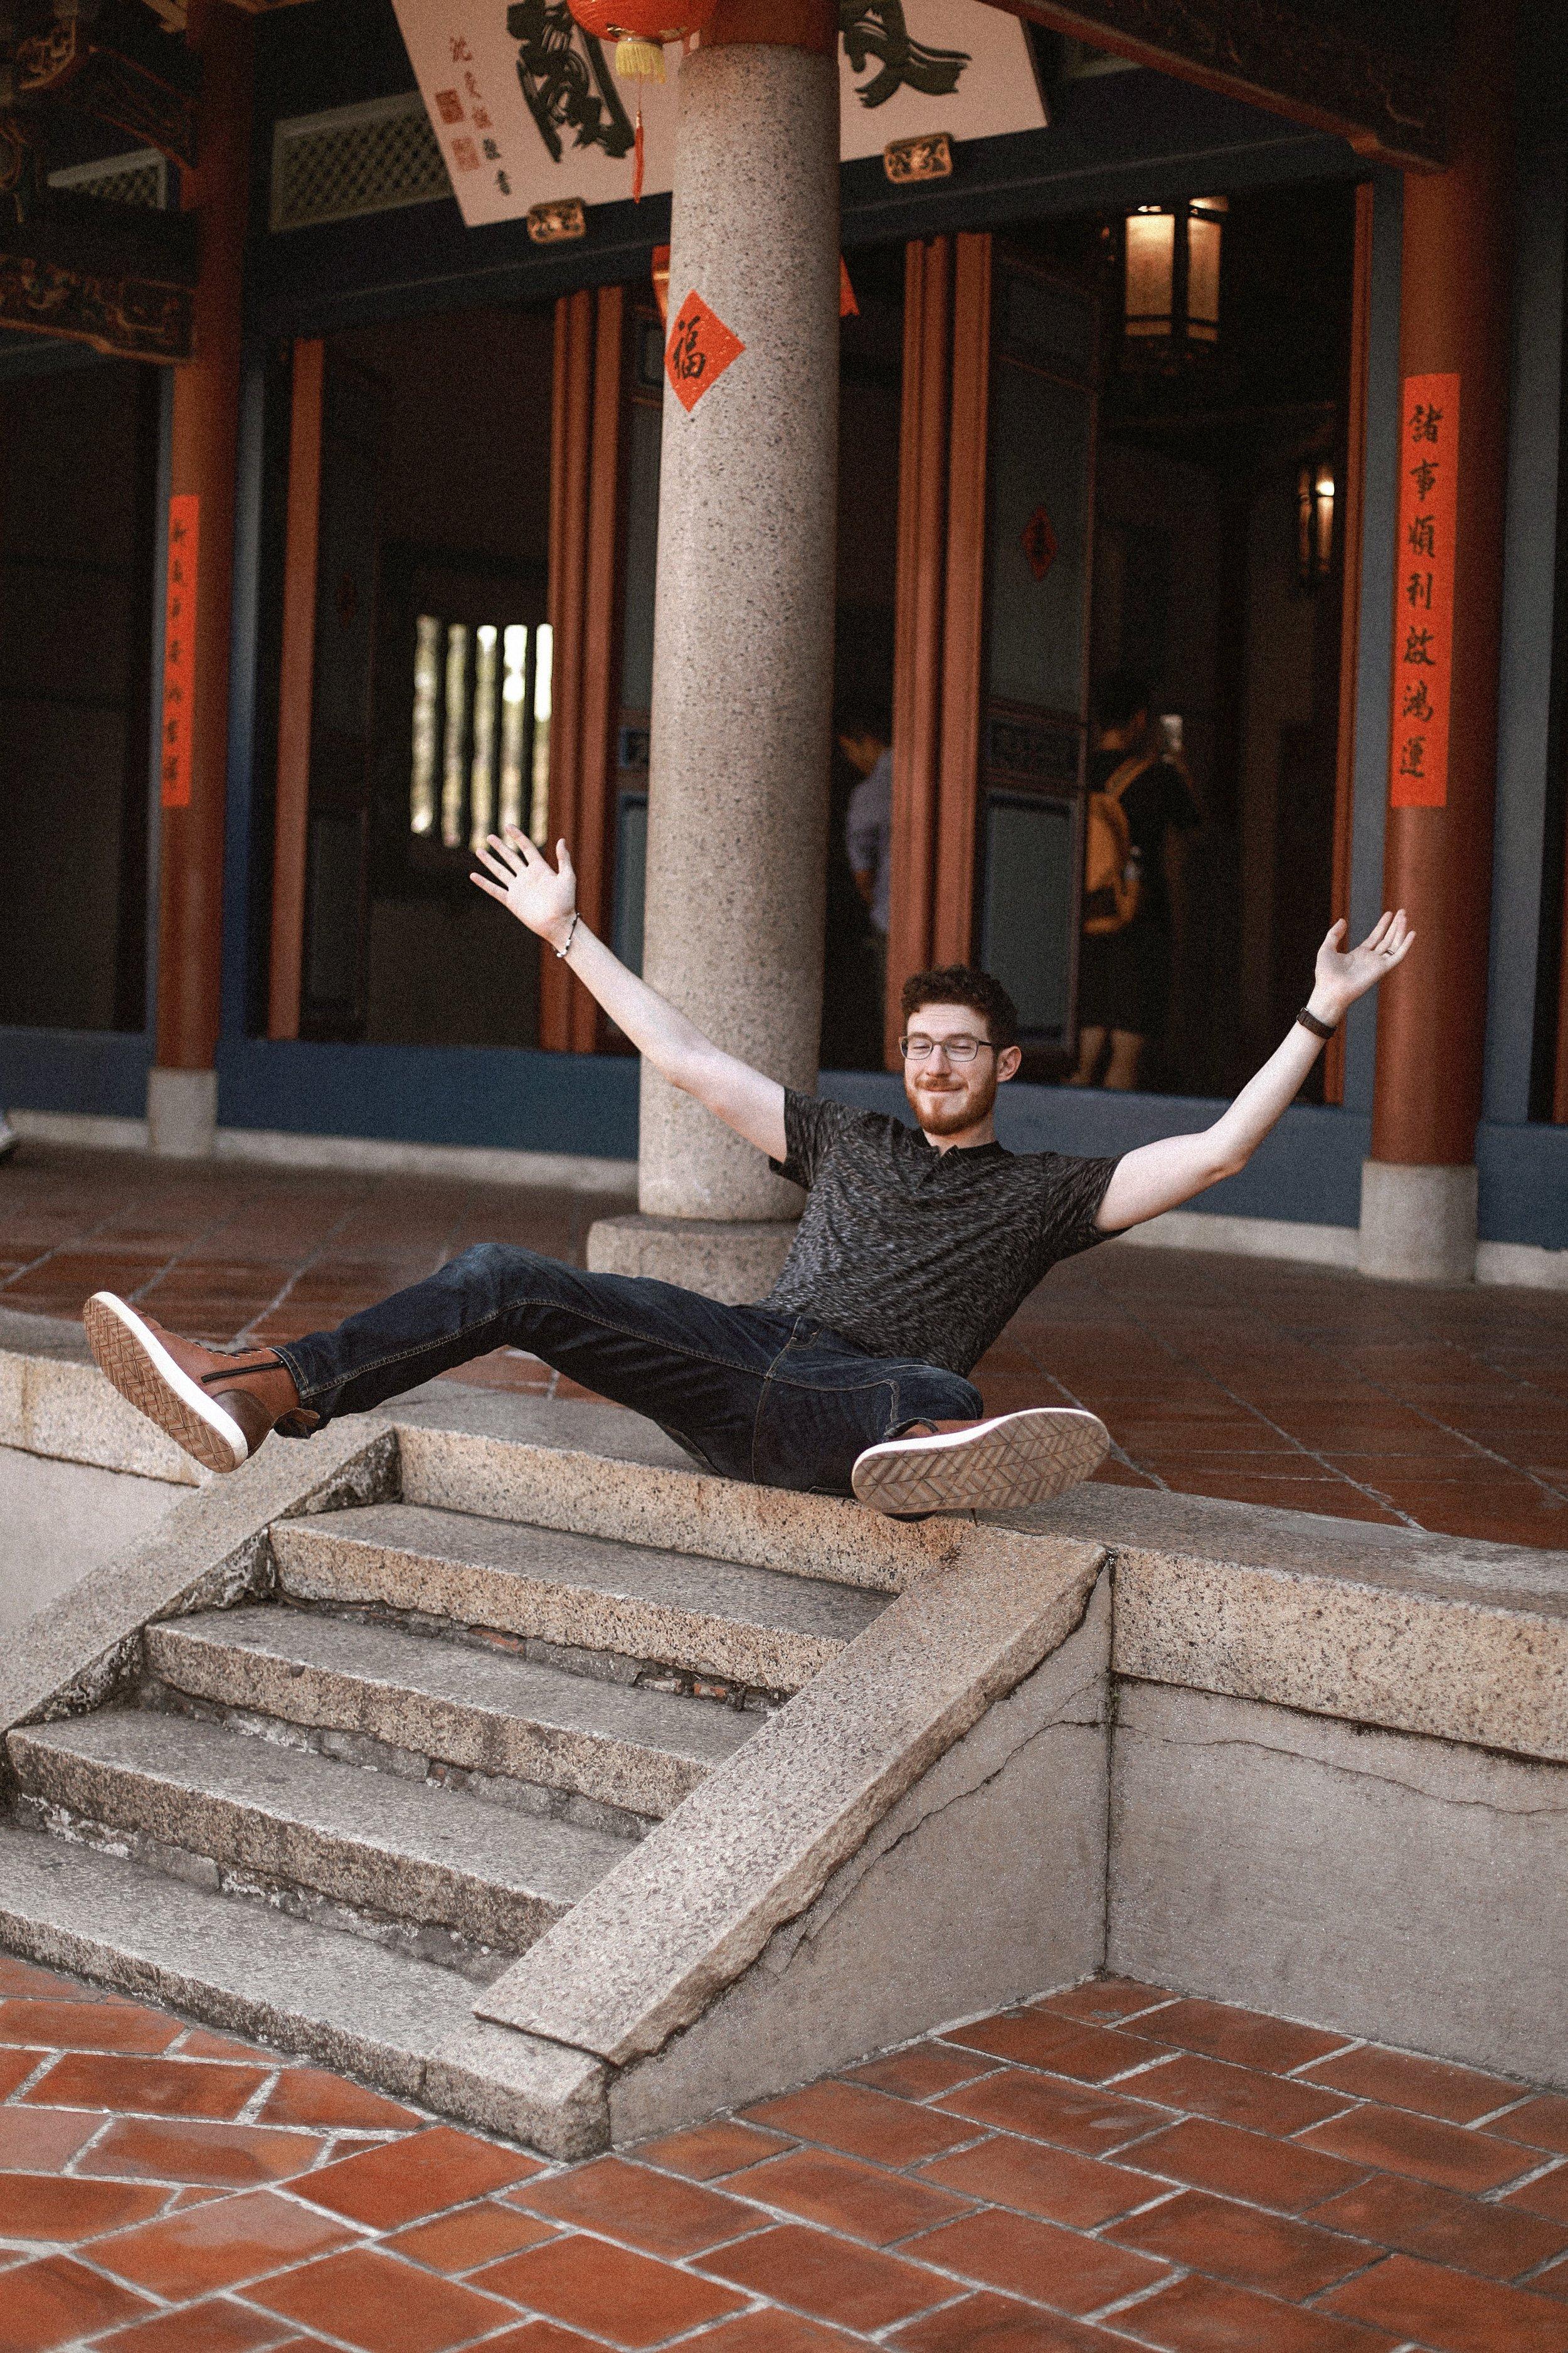 Chihkan Tower - Tainan - And Away We Went